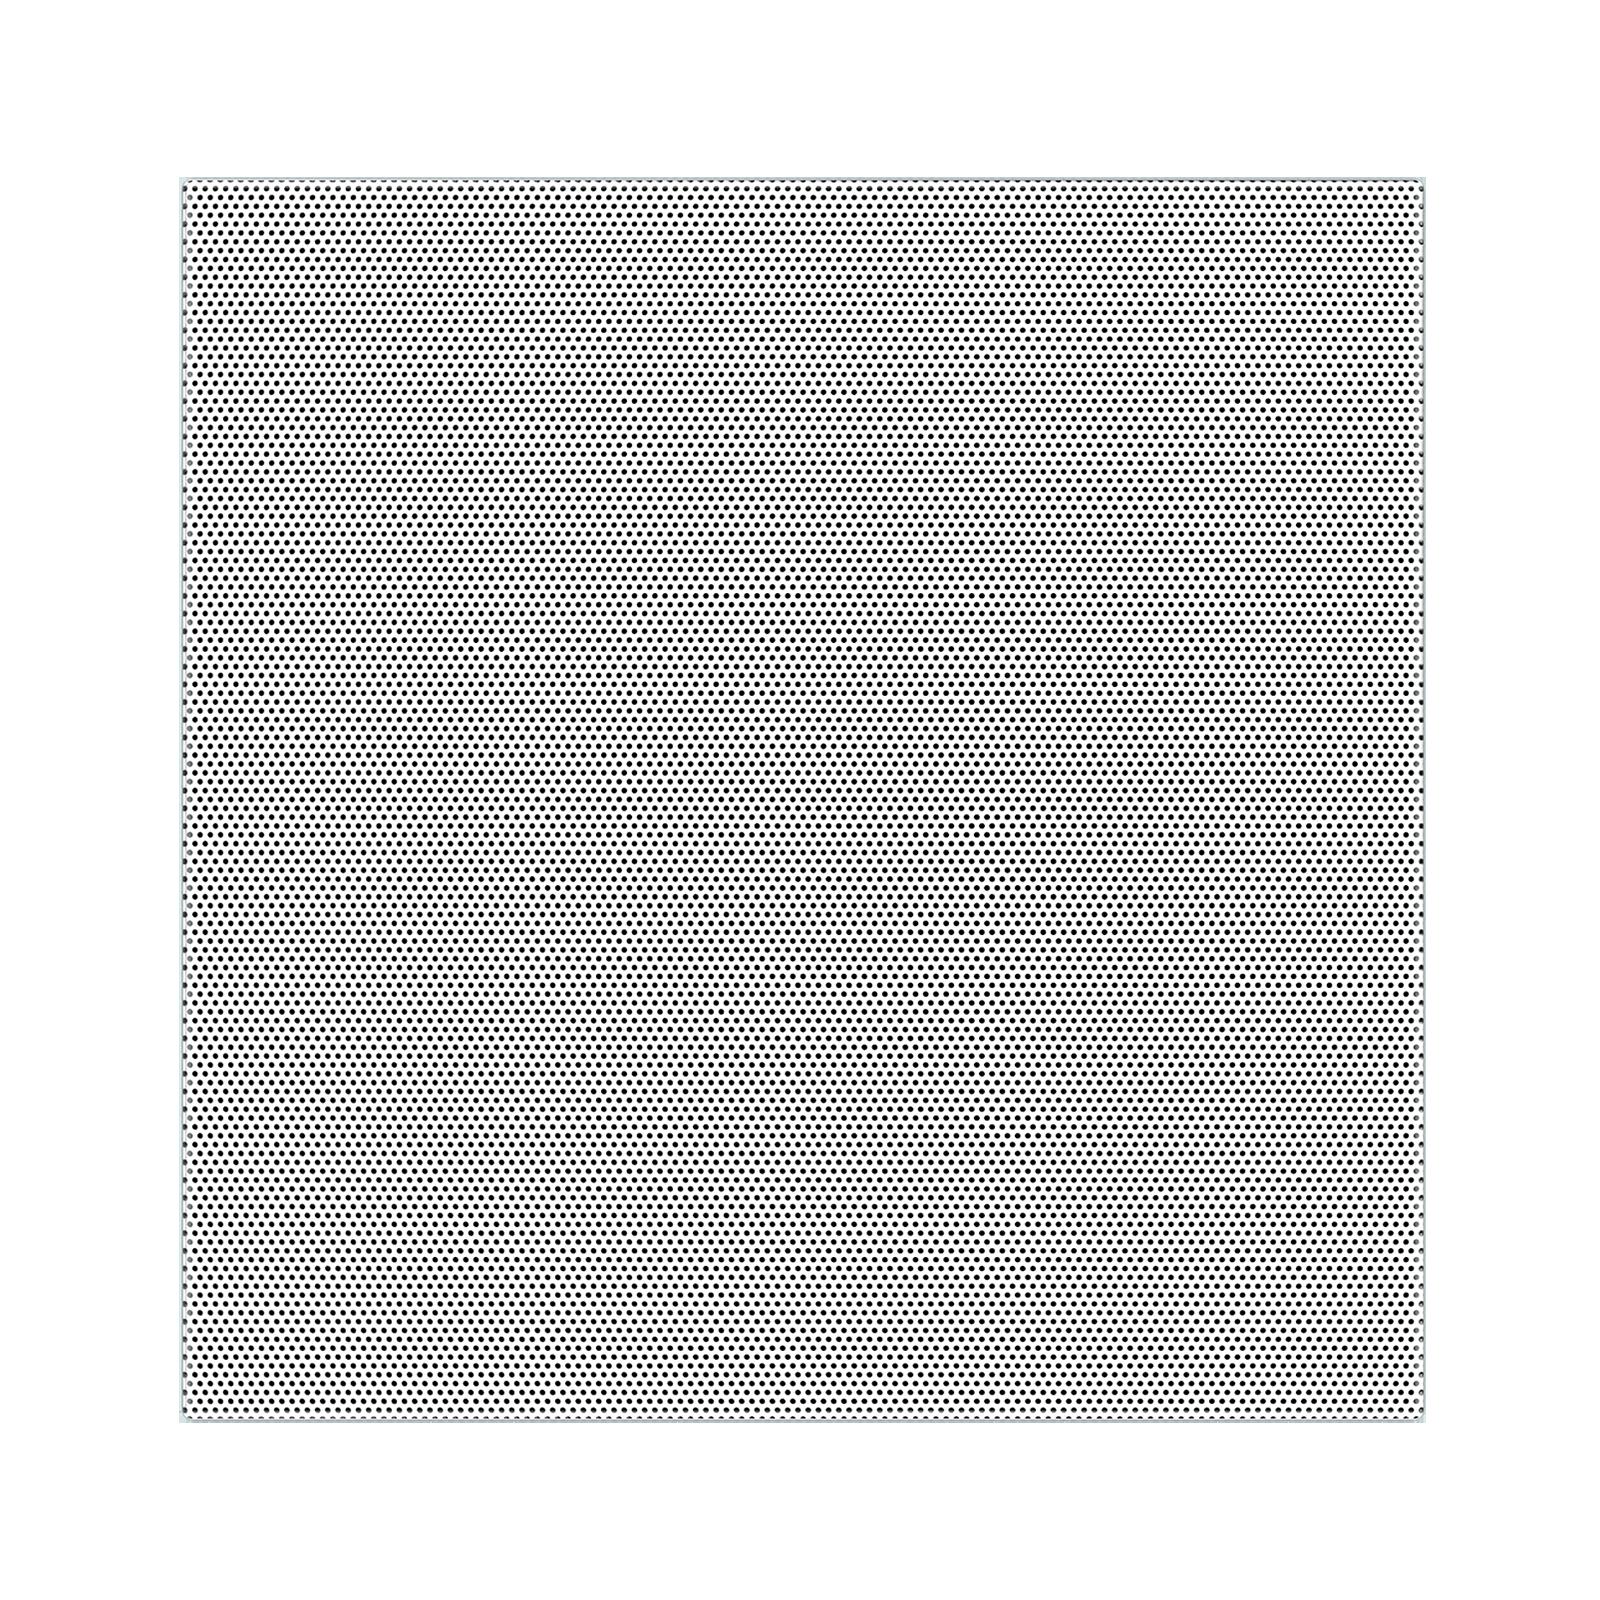 SCL-5 - Black - 2-Way 7-inch (180mm) In-Ceiling Loudspeaker - Detailshot 3